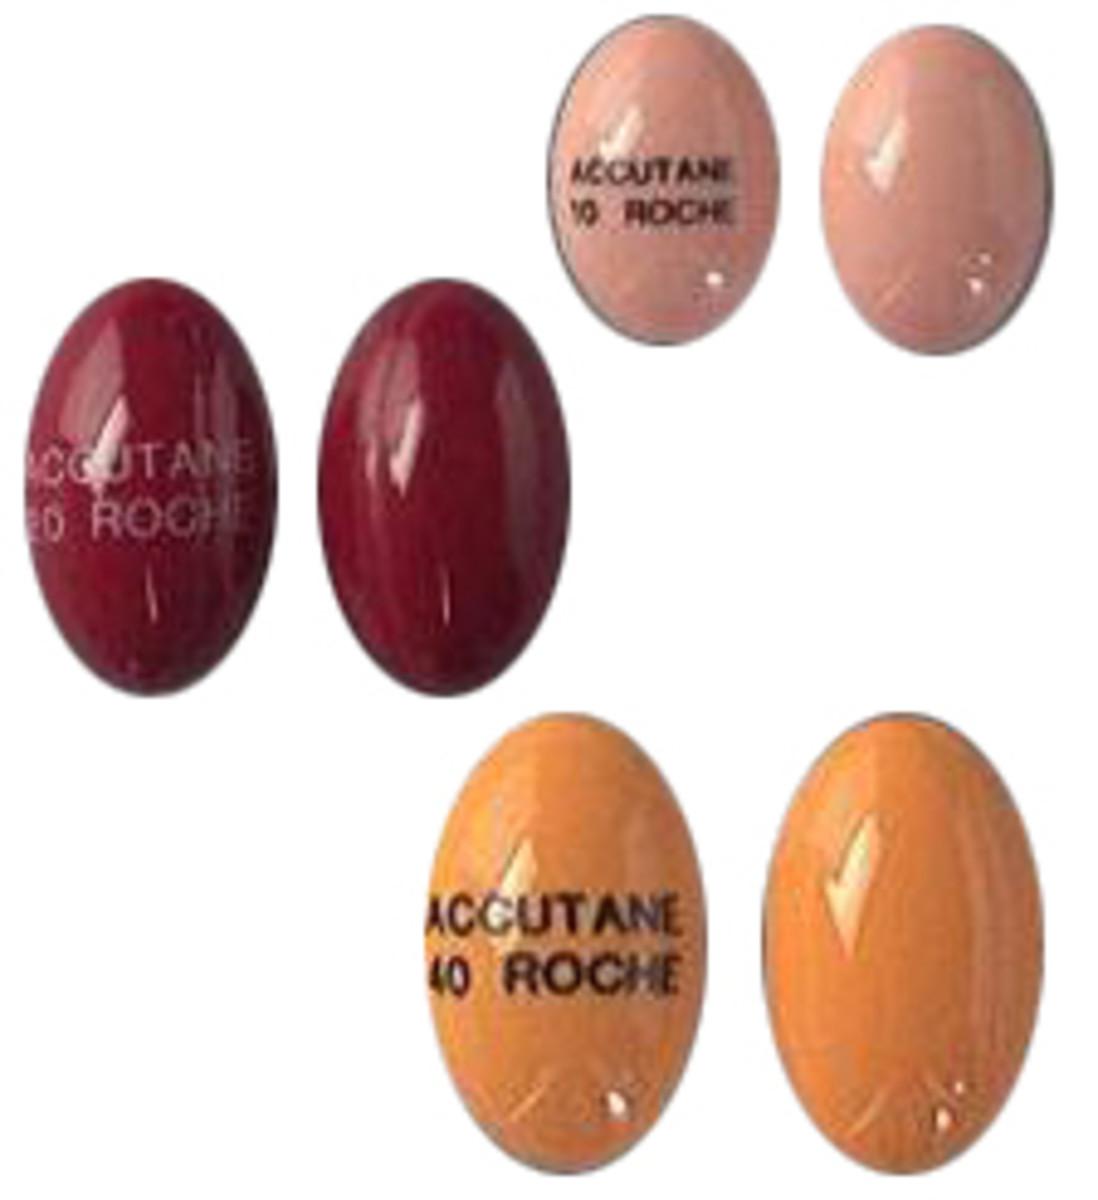 accutane dosage study